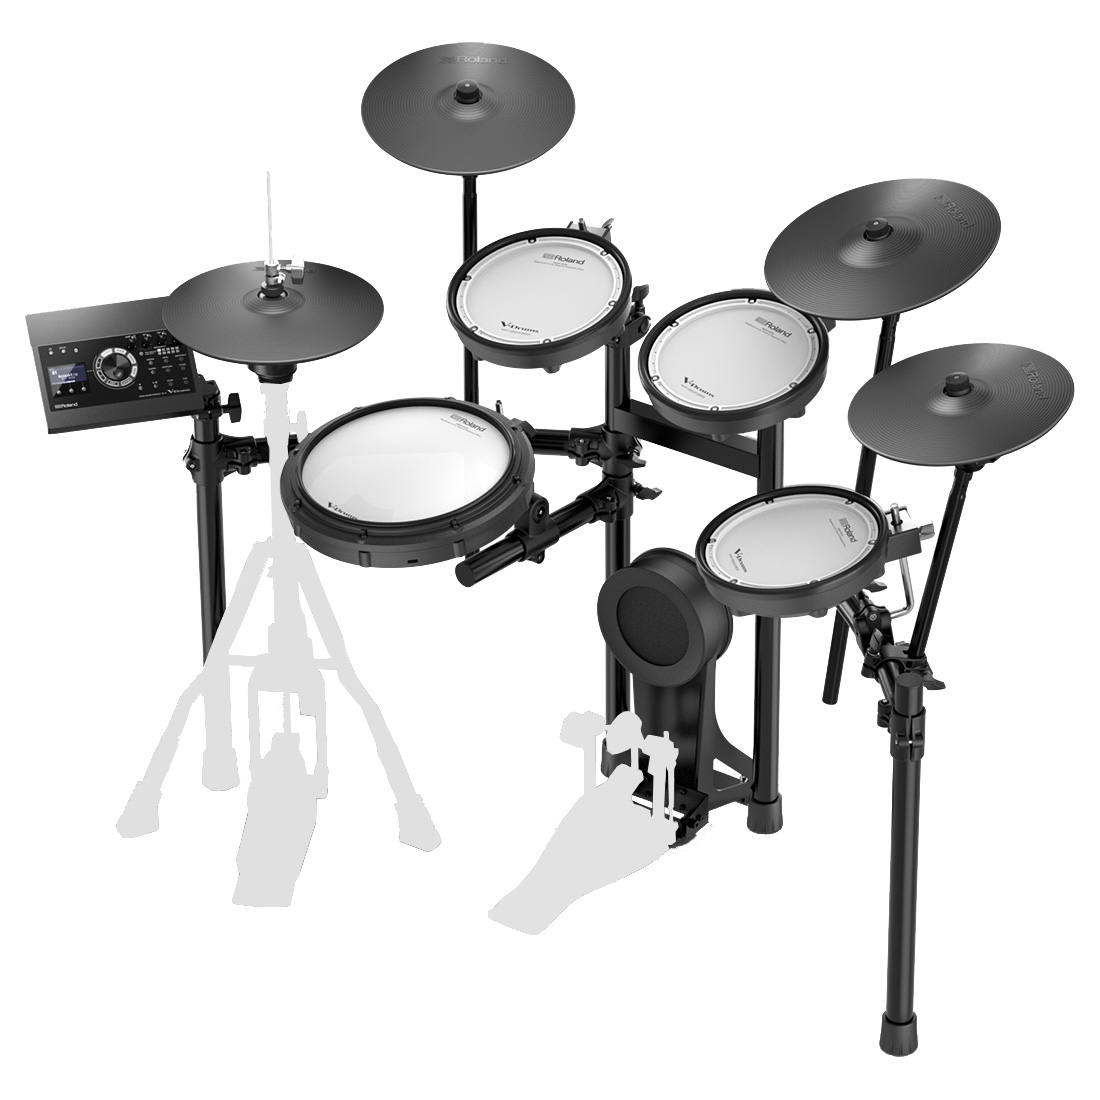 【Rolandキャッシュバック5000円対象】Roland 電子ドラム TD-17KVX-S ローランド V-Drums Kit【YRK】